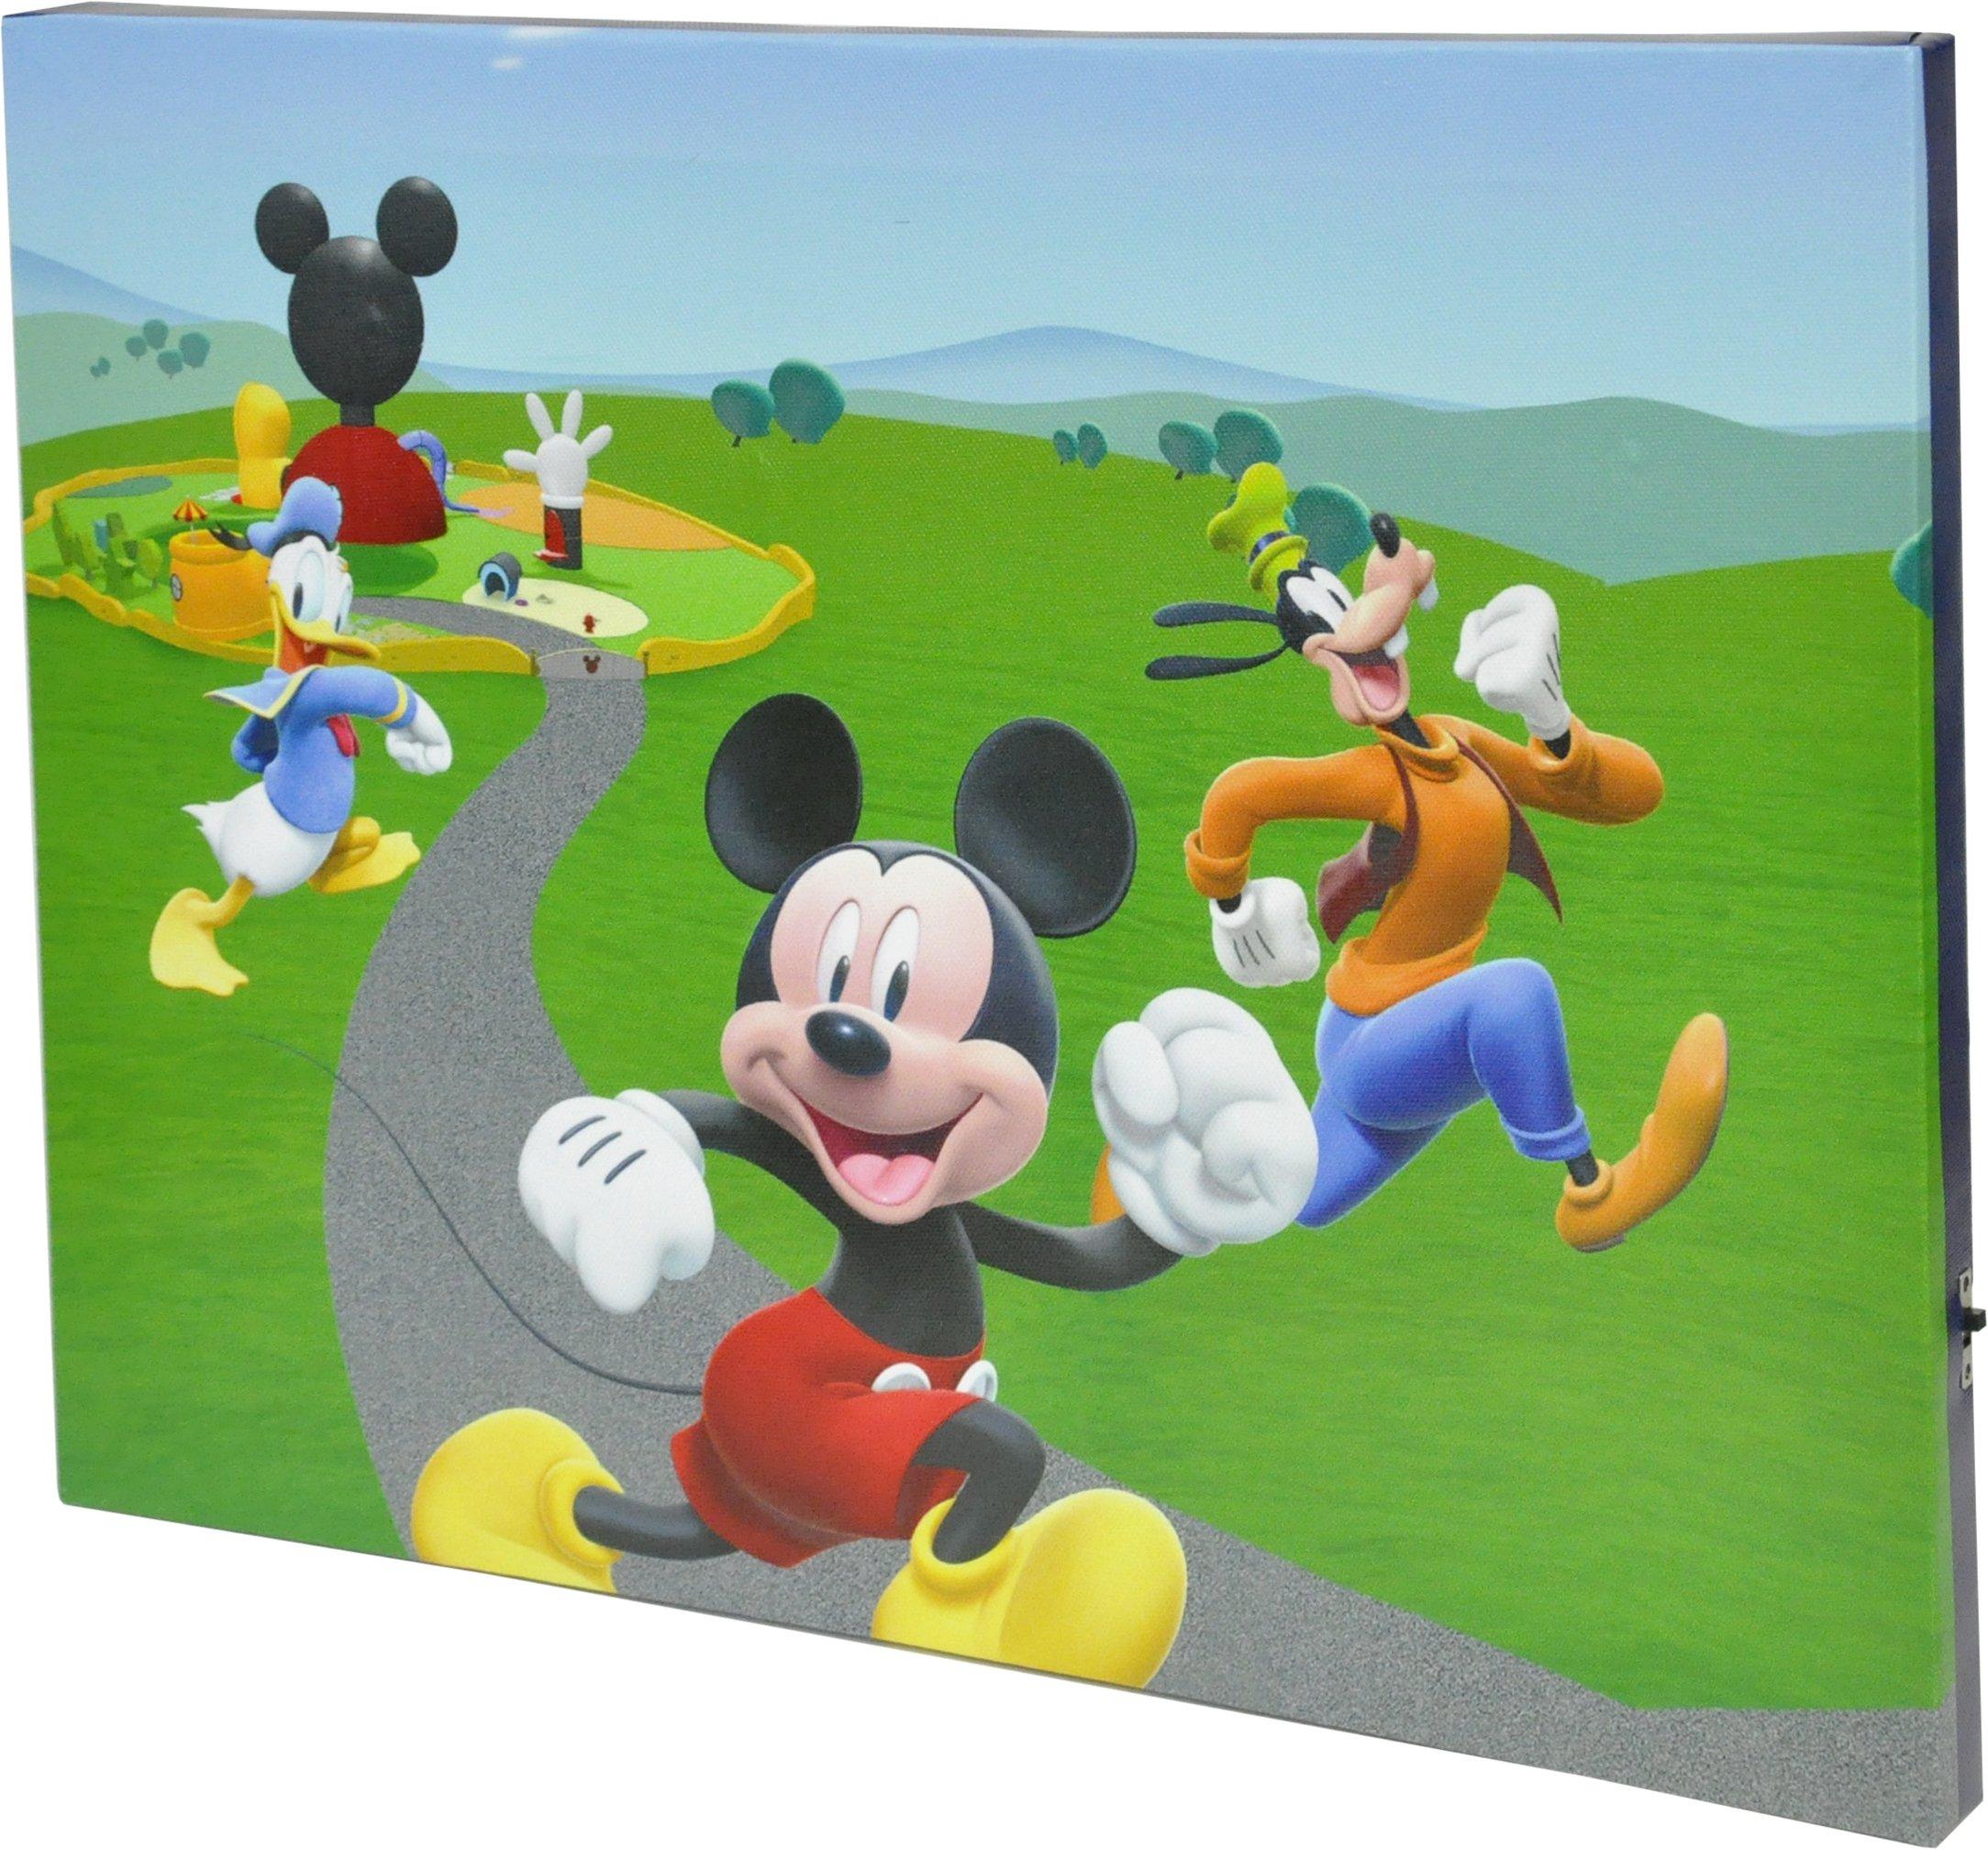 Disney Mickey Mouse Canvas LED Wall Art